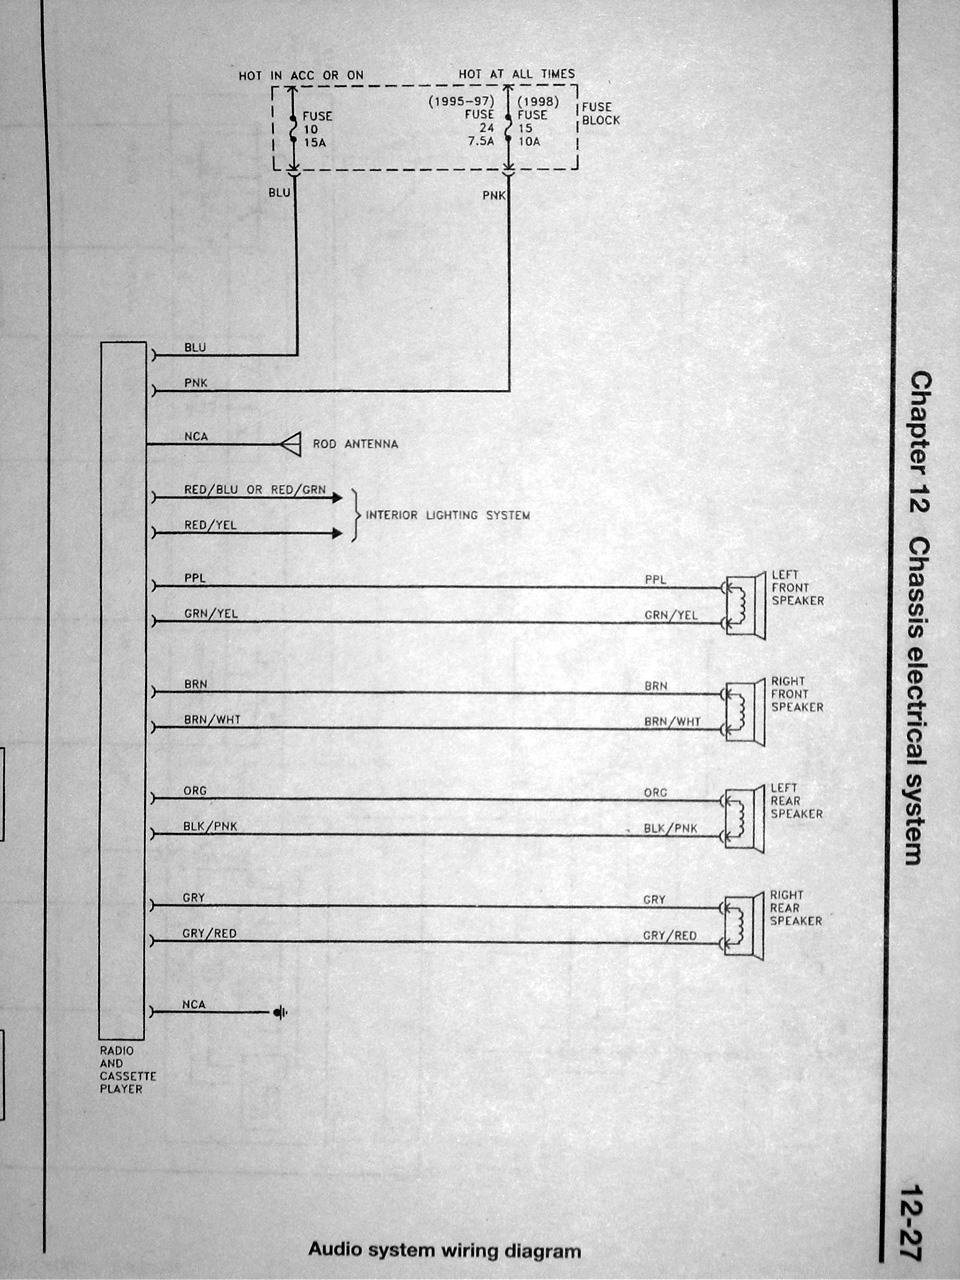 2003 Infiniti G35 Radio Wiring Diagram : infiniti, radio, wiring, diagram, Wiring, Diagram, Thread, *Useful, Info*, Nissan, Forum